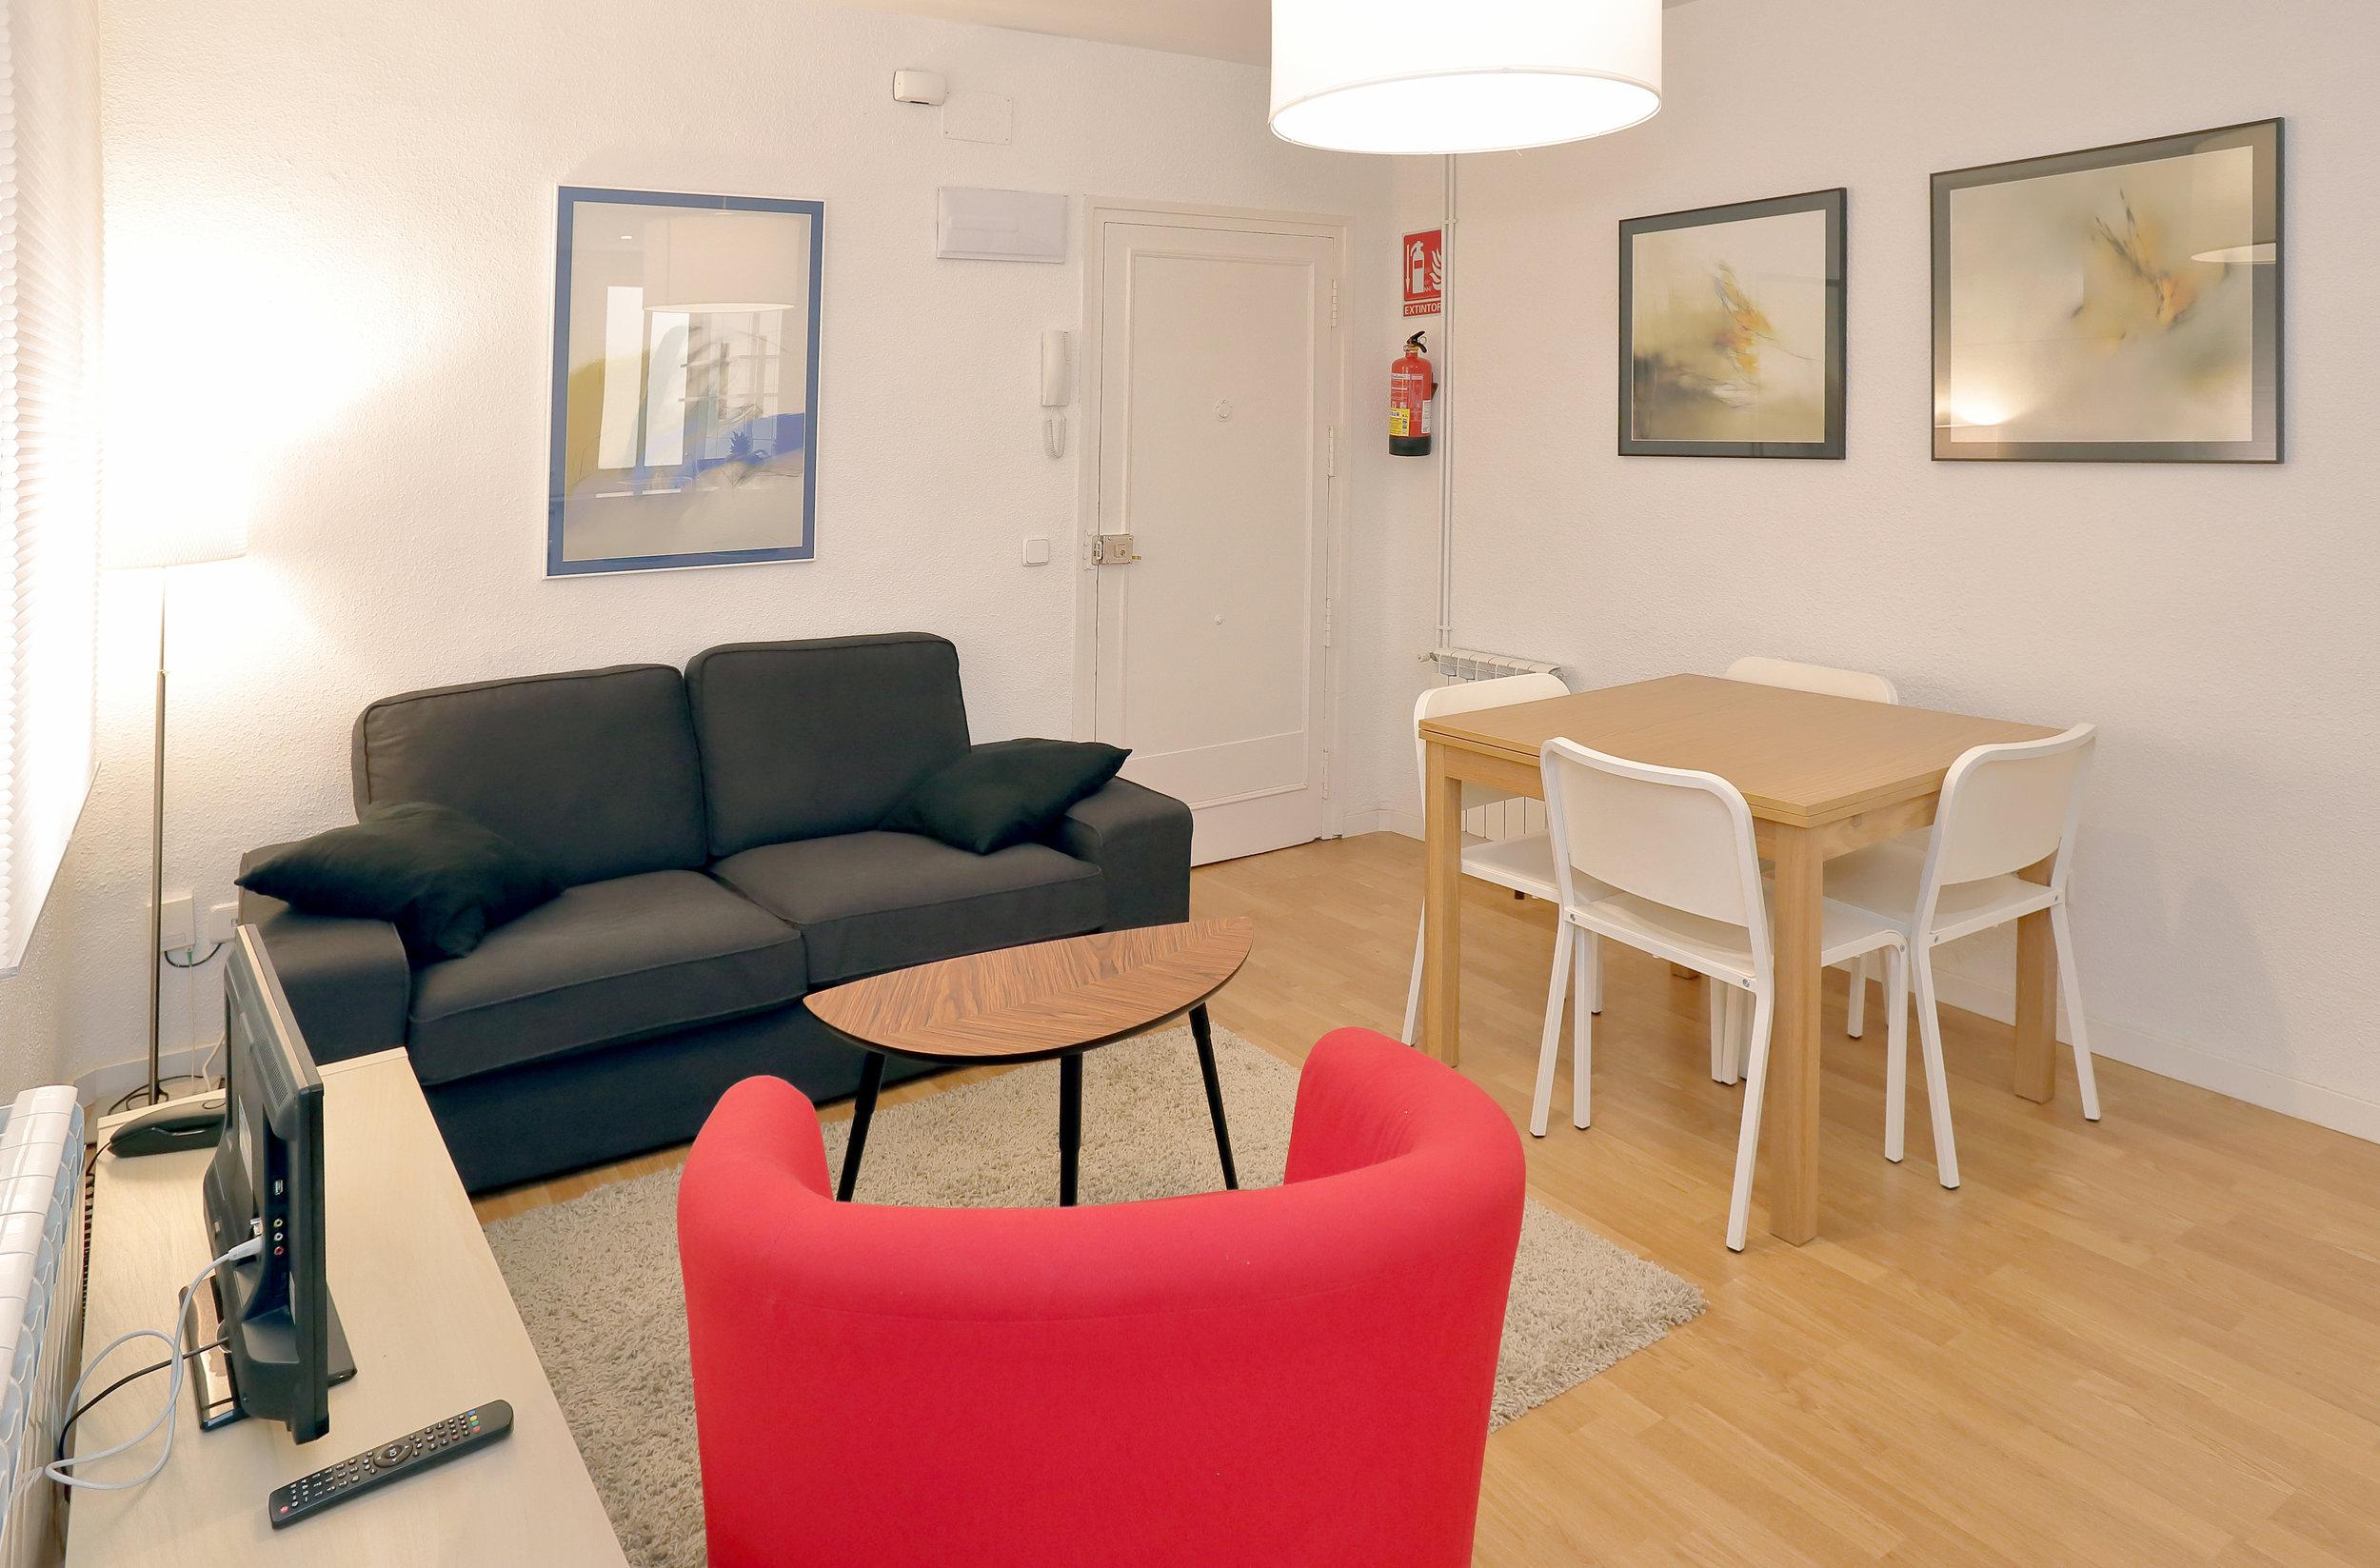 CEA 3M Living room_MG_2637.JPG